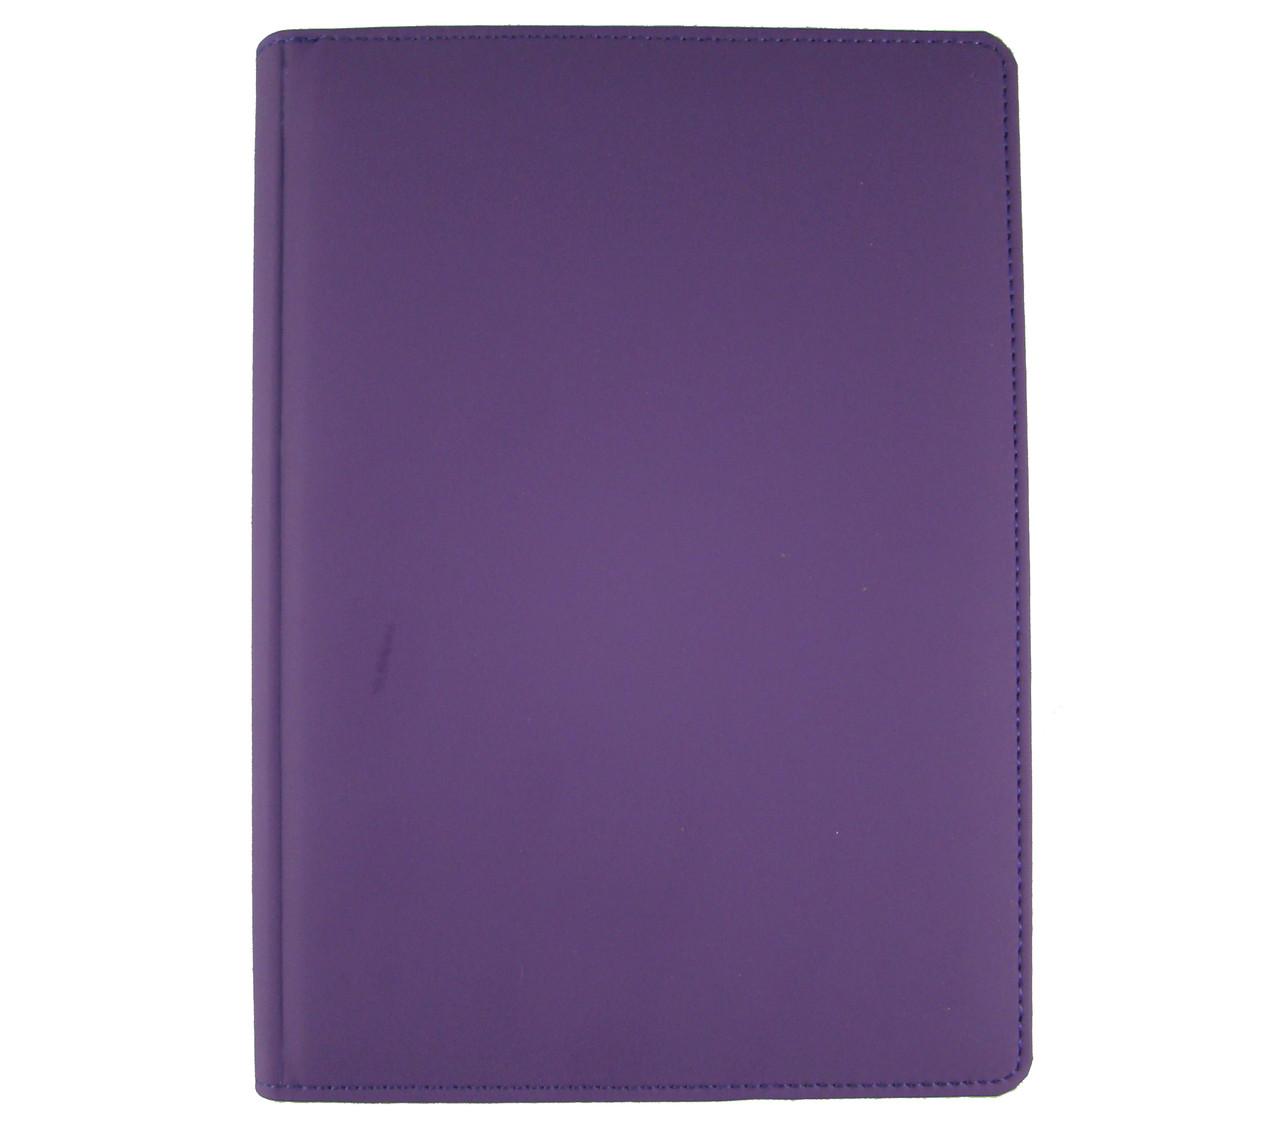 Ежедневник недатированный BRISK Vienna Стандарт А5(14,2х20,3) фиолетовый